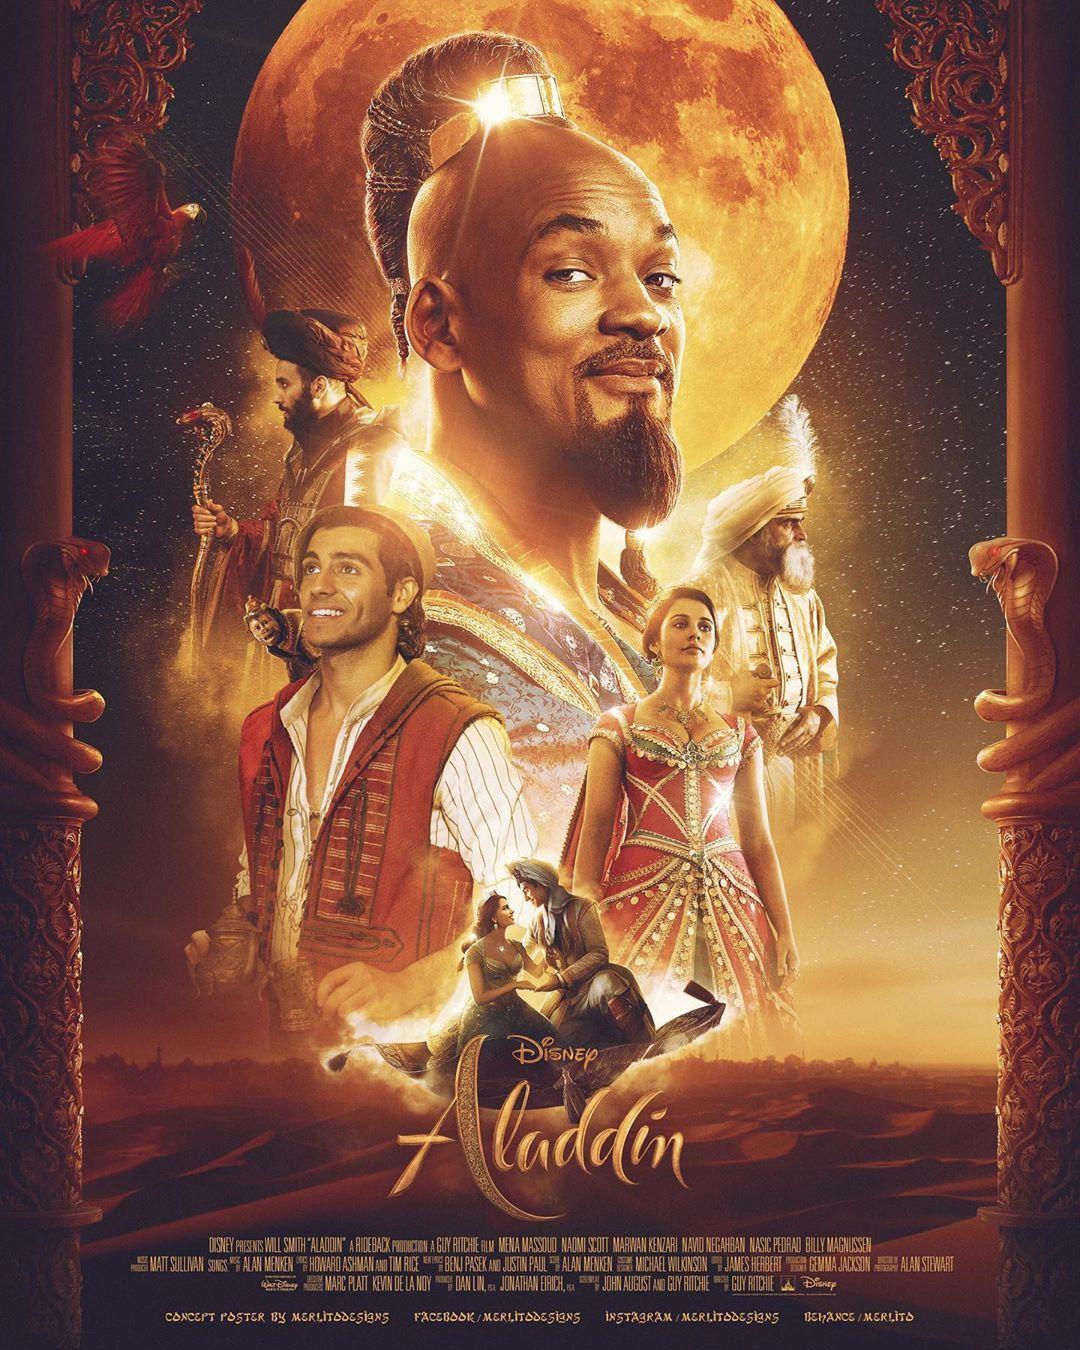 Disney S Aladdin Concept Poster By Merlitopabatao